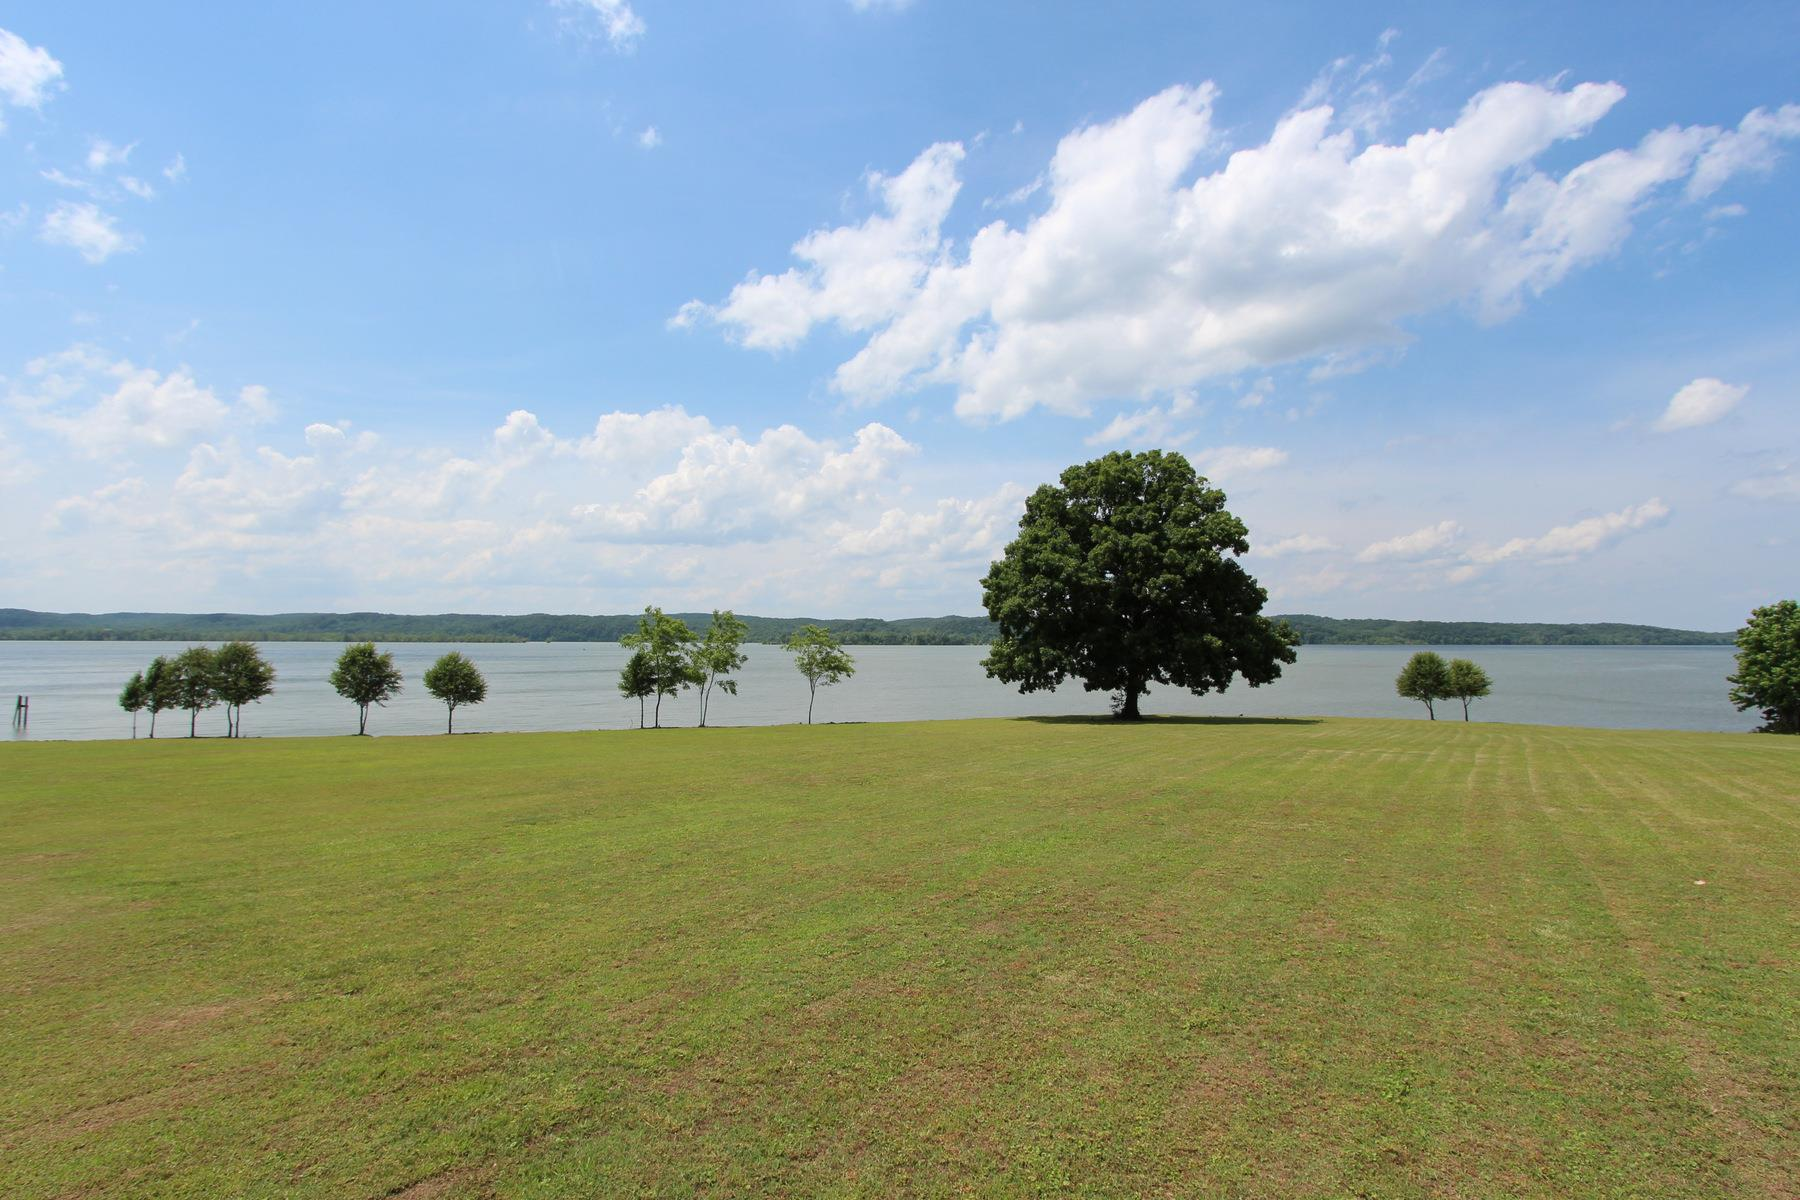 297 Morning Glory Way, Waverly, TN 37185 - Waverly, TN real estate listing